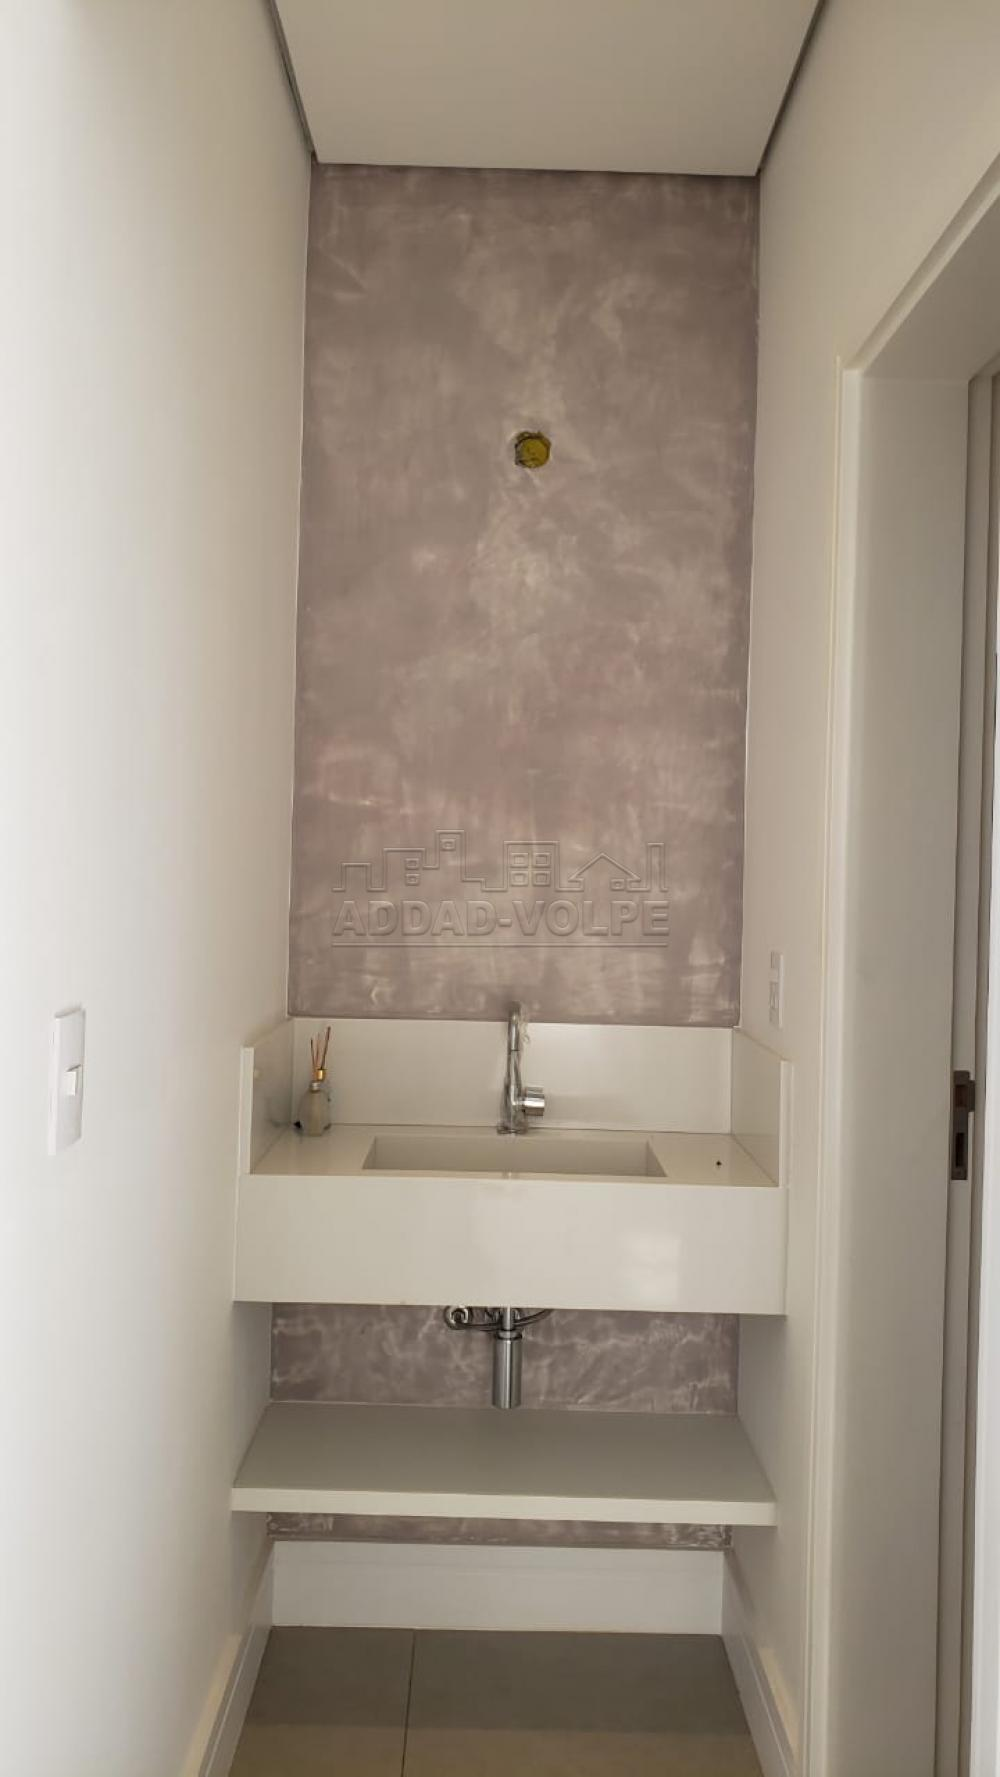 Comprar Casa / Condomínio em Bauru R$ 1.280.000,00 - Foto 7